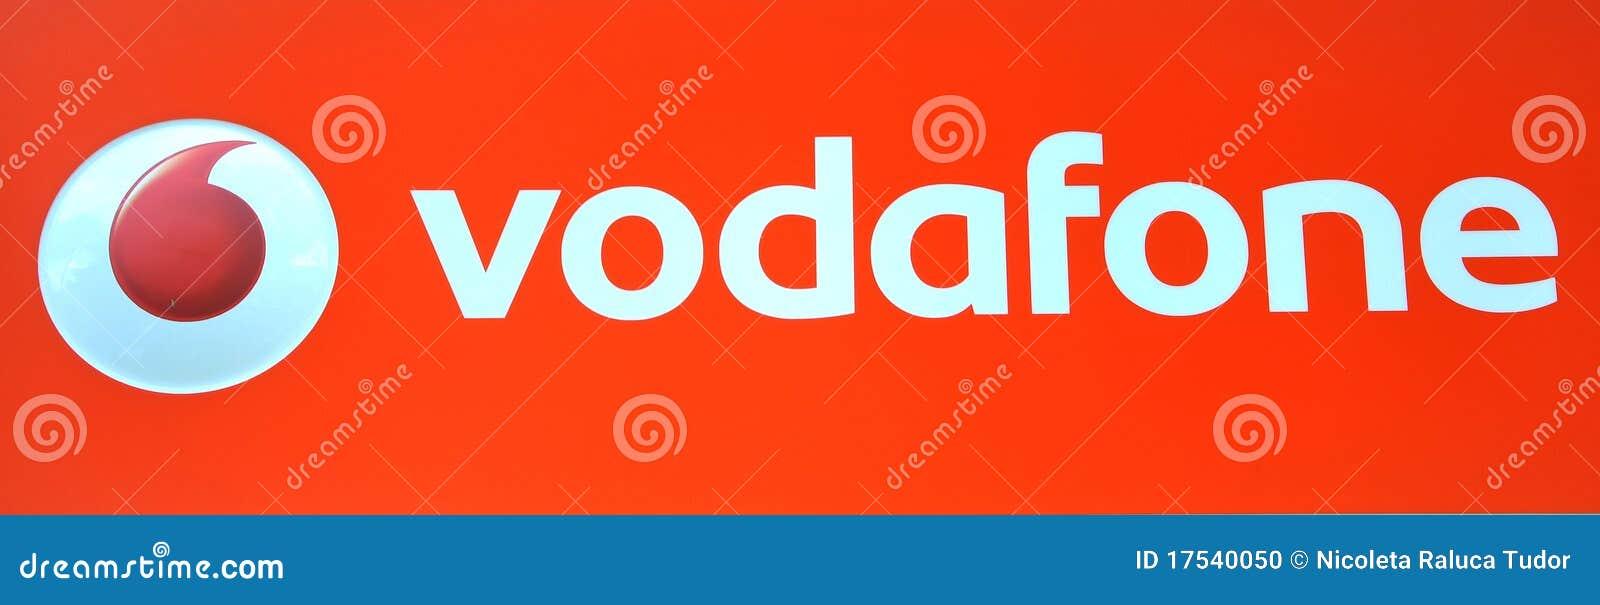 Vodafone логоса